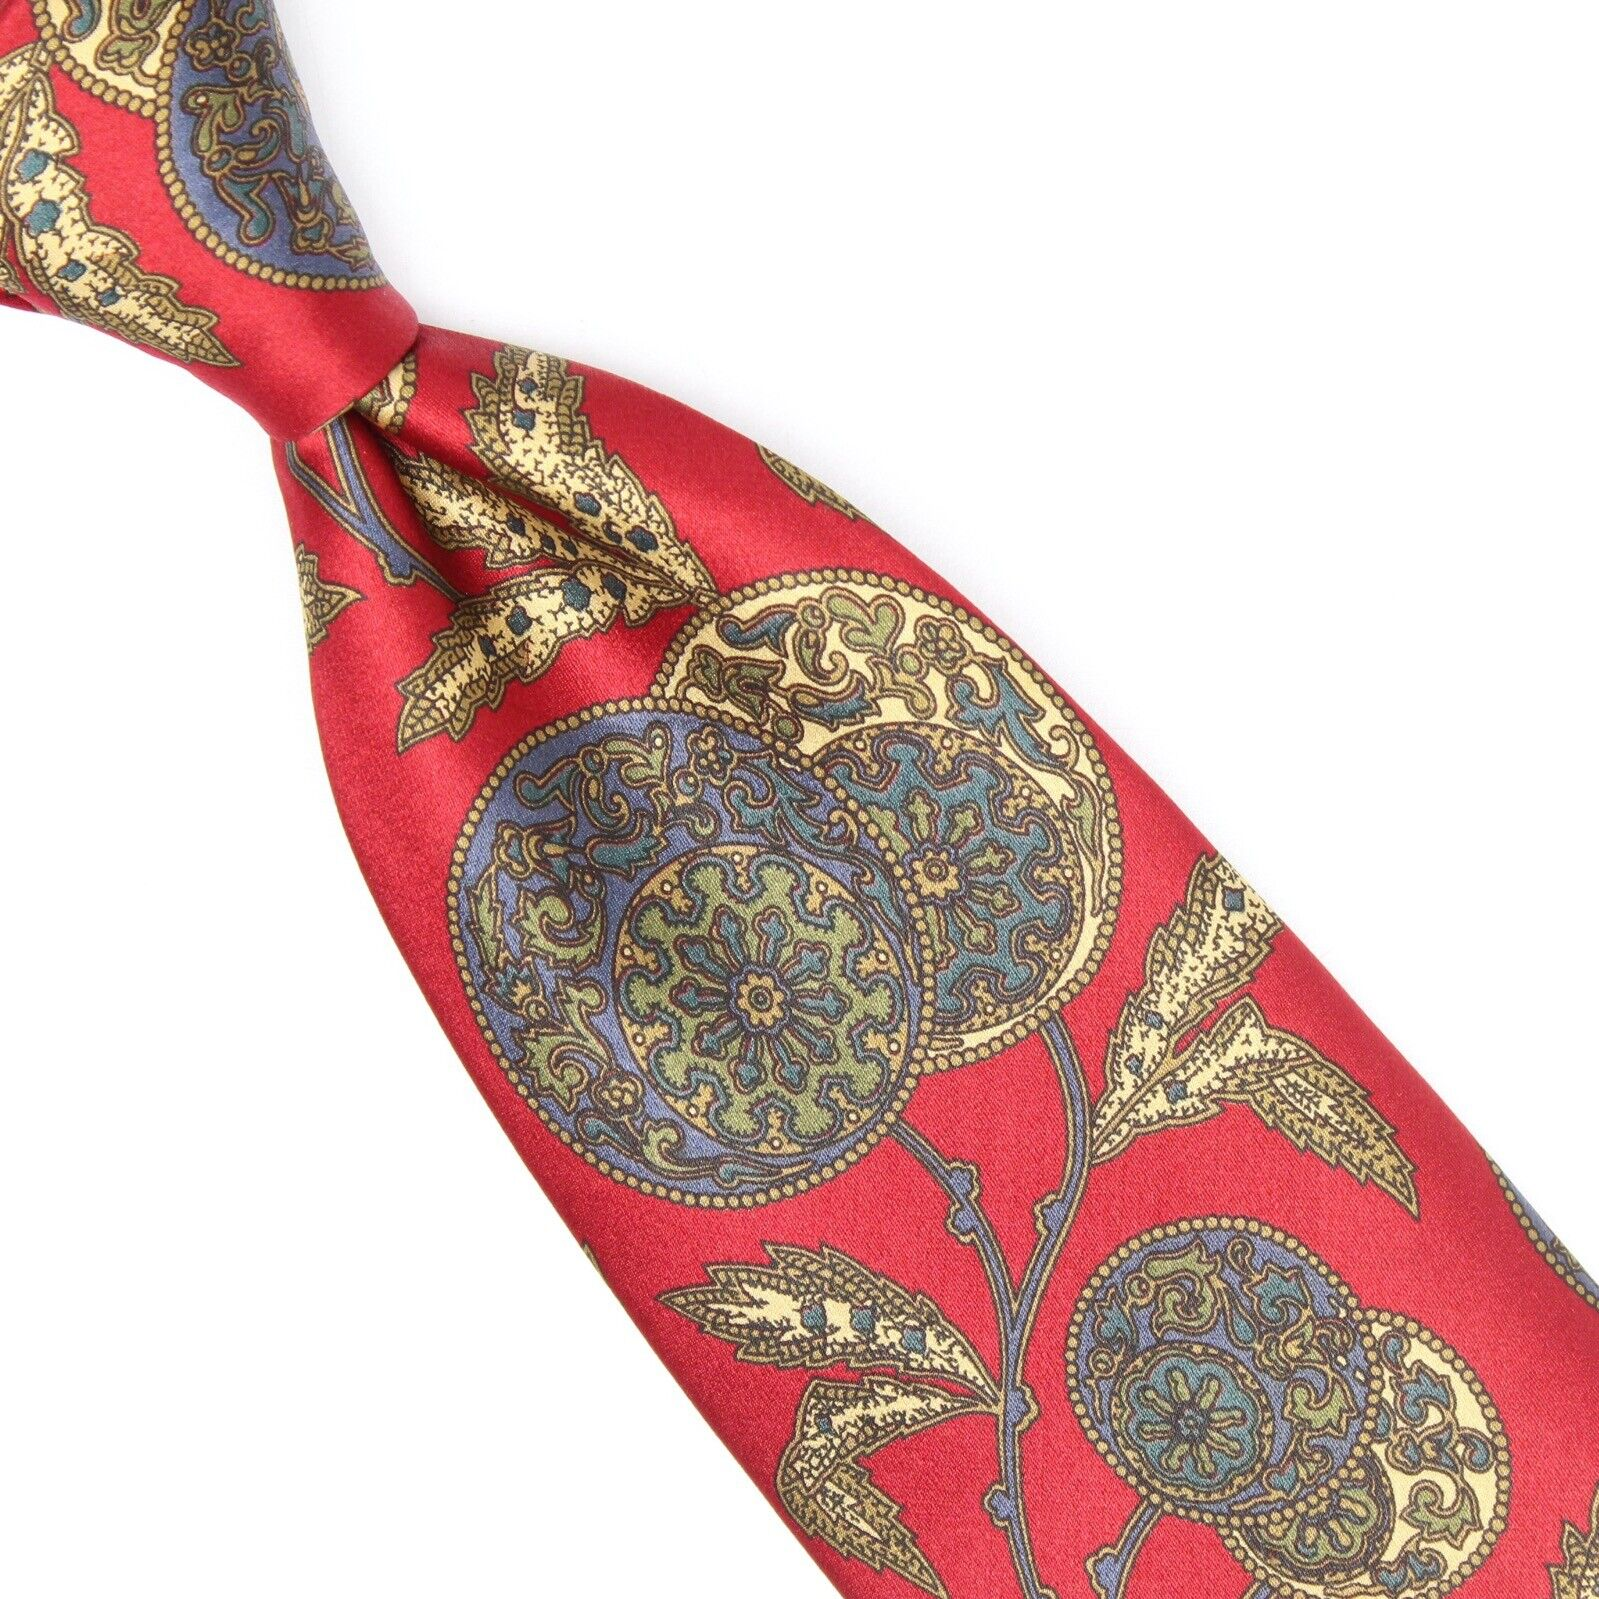 GANT Herren Seide Krawatte Rot Grün Blau Champagner Geblümt Paisley Glatt Druck